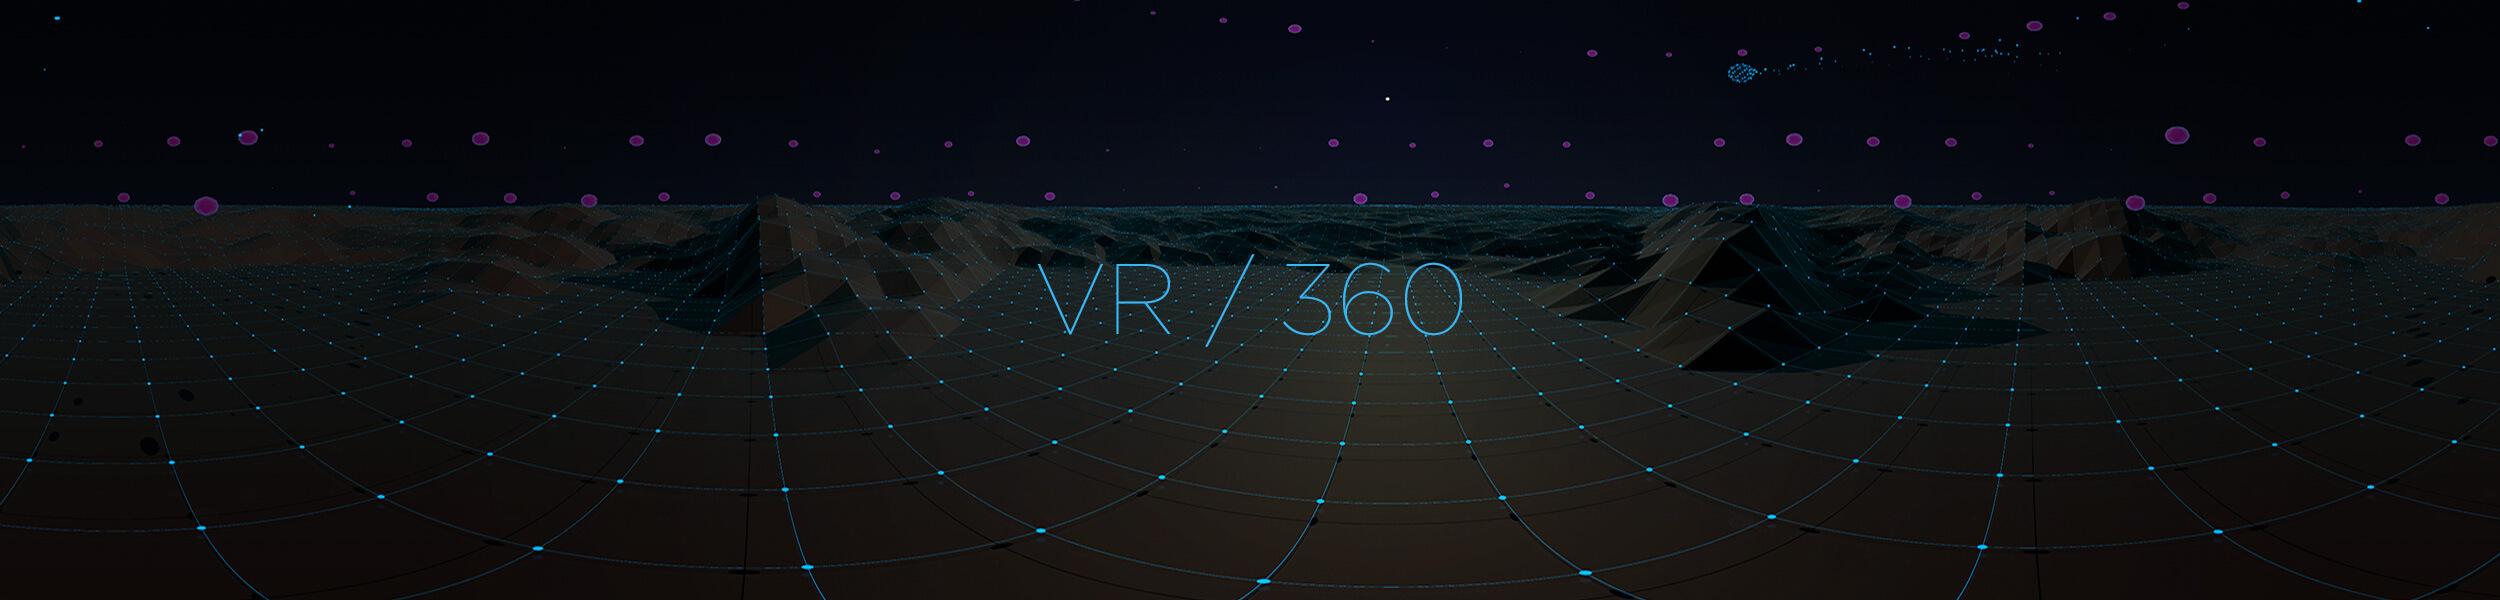 VR / 360